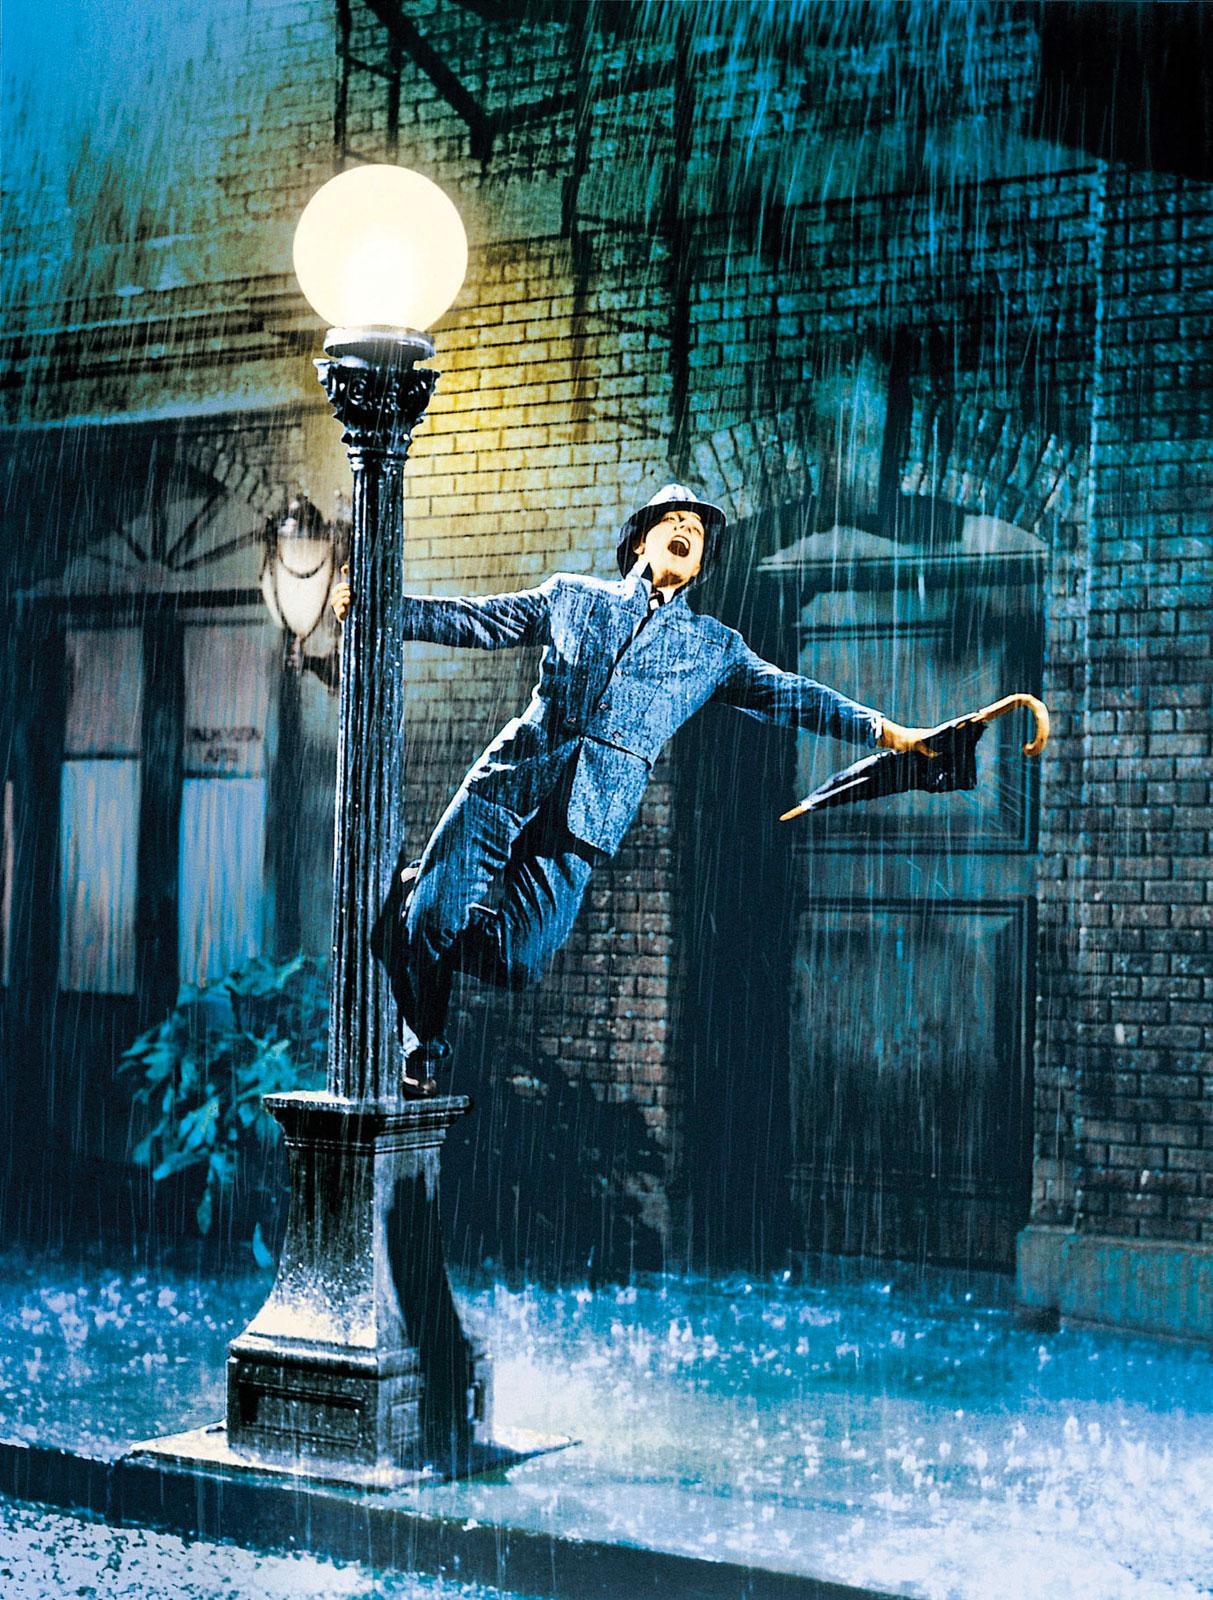 http://4.bp.blogspot.com/-N6oEqz41moQ/UPwxM4HmauI/AAAAAAAABoo/IomVClVksSs/s1600/singin-in-the-rain.jpg